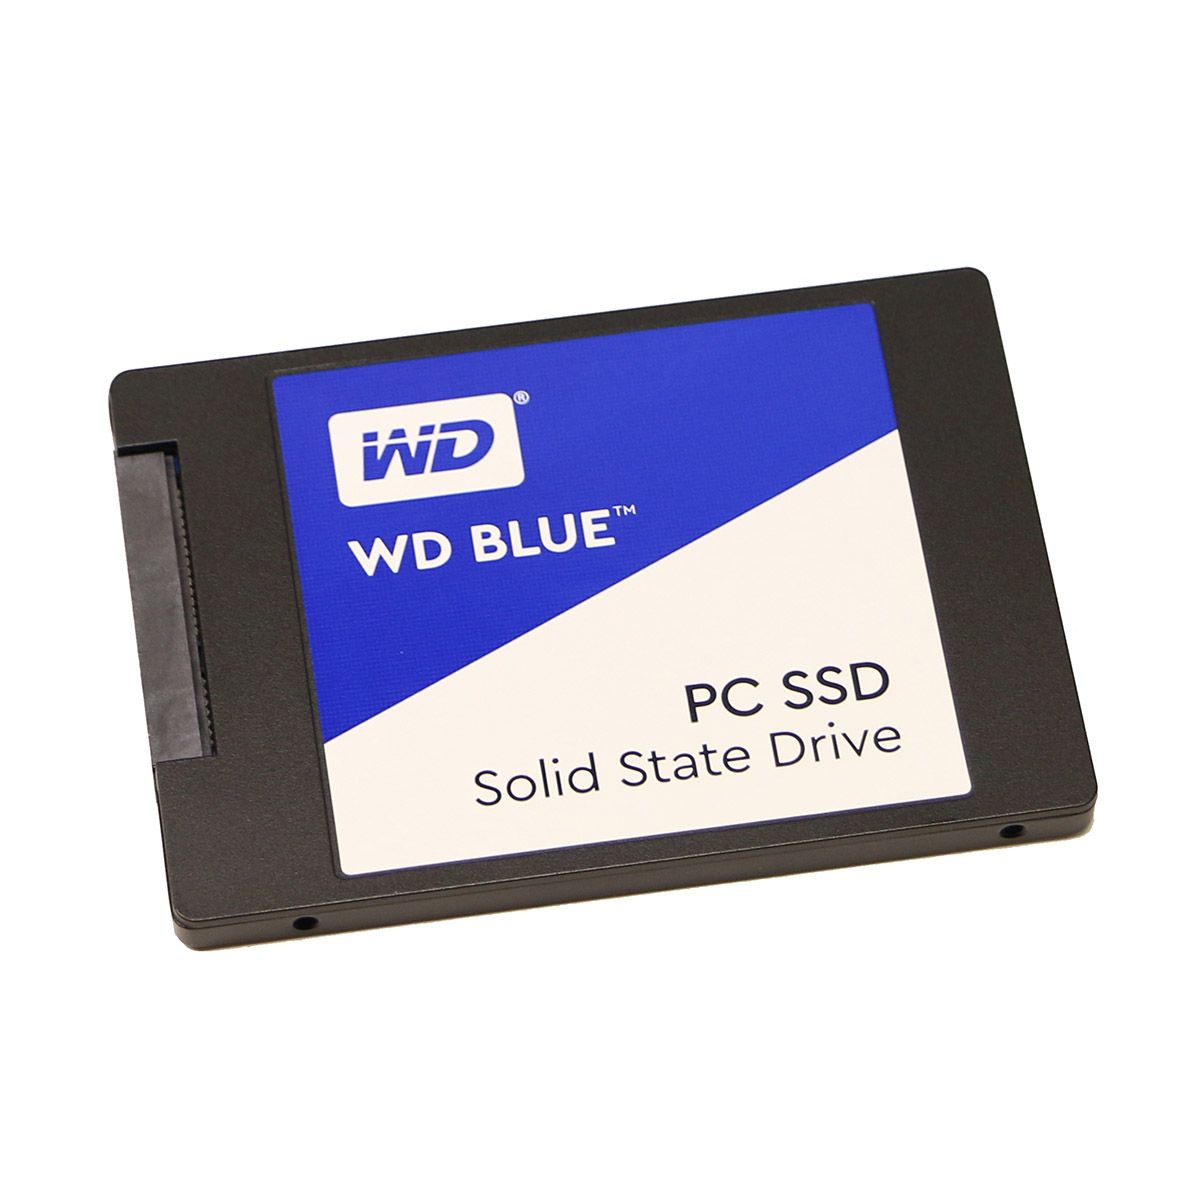 HDD SSD WD 250GB 2.5 INCH SATA3 SSD WD BLUE, SSD HDD